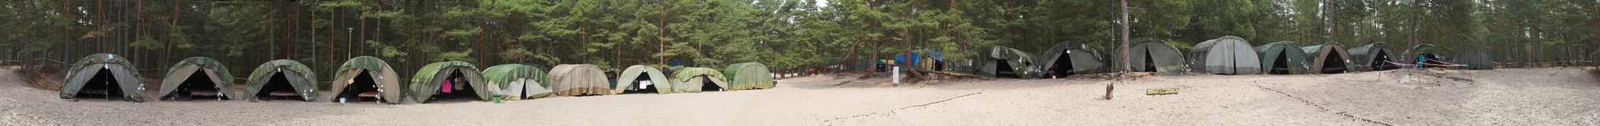 campingplatsen spanar Royaltyfria Bilder